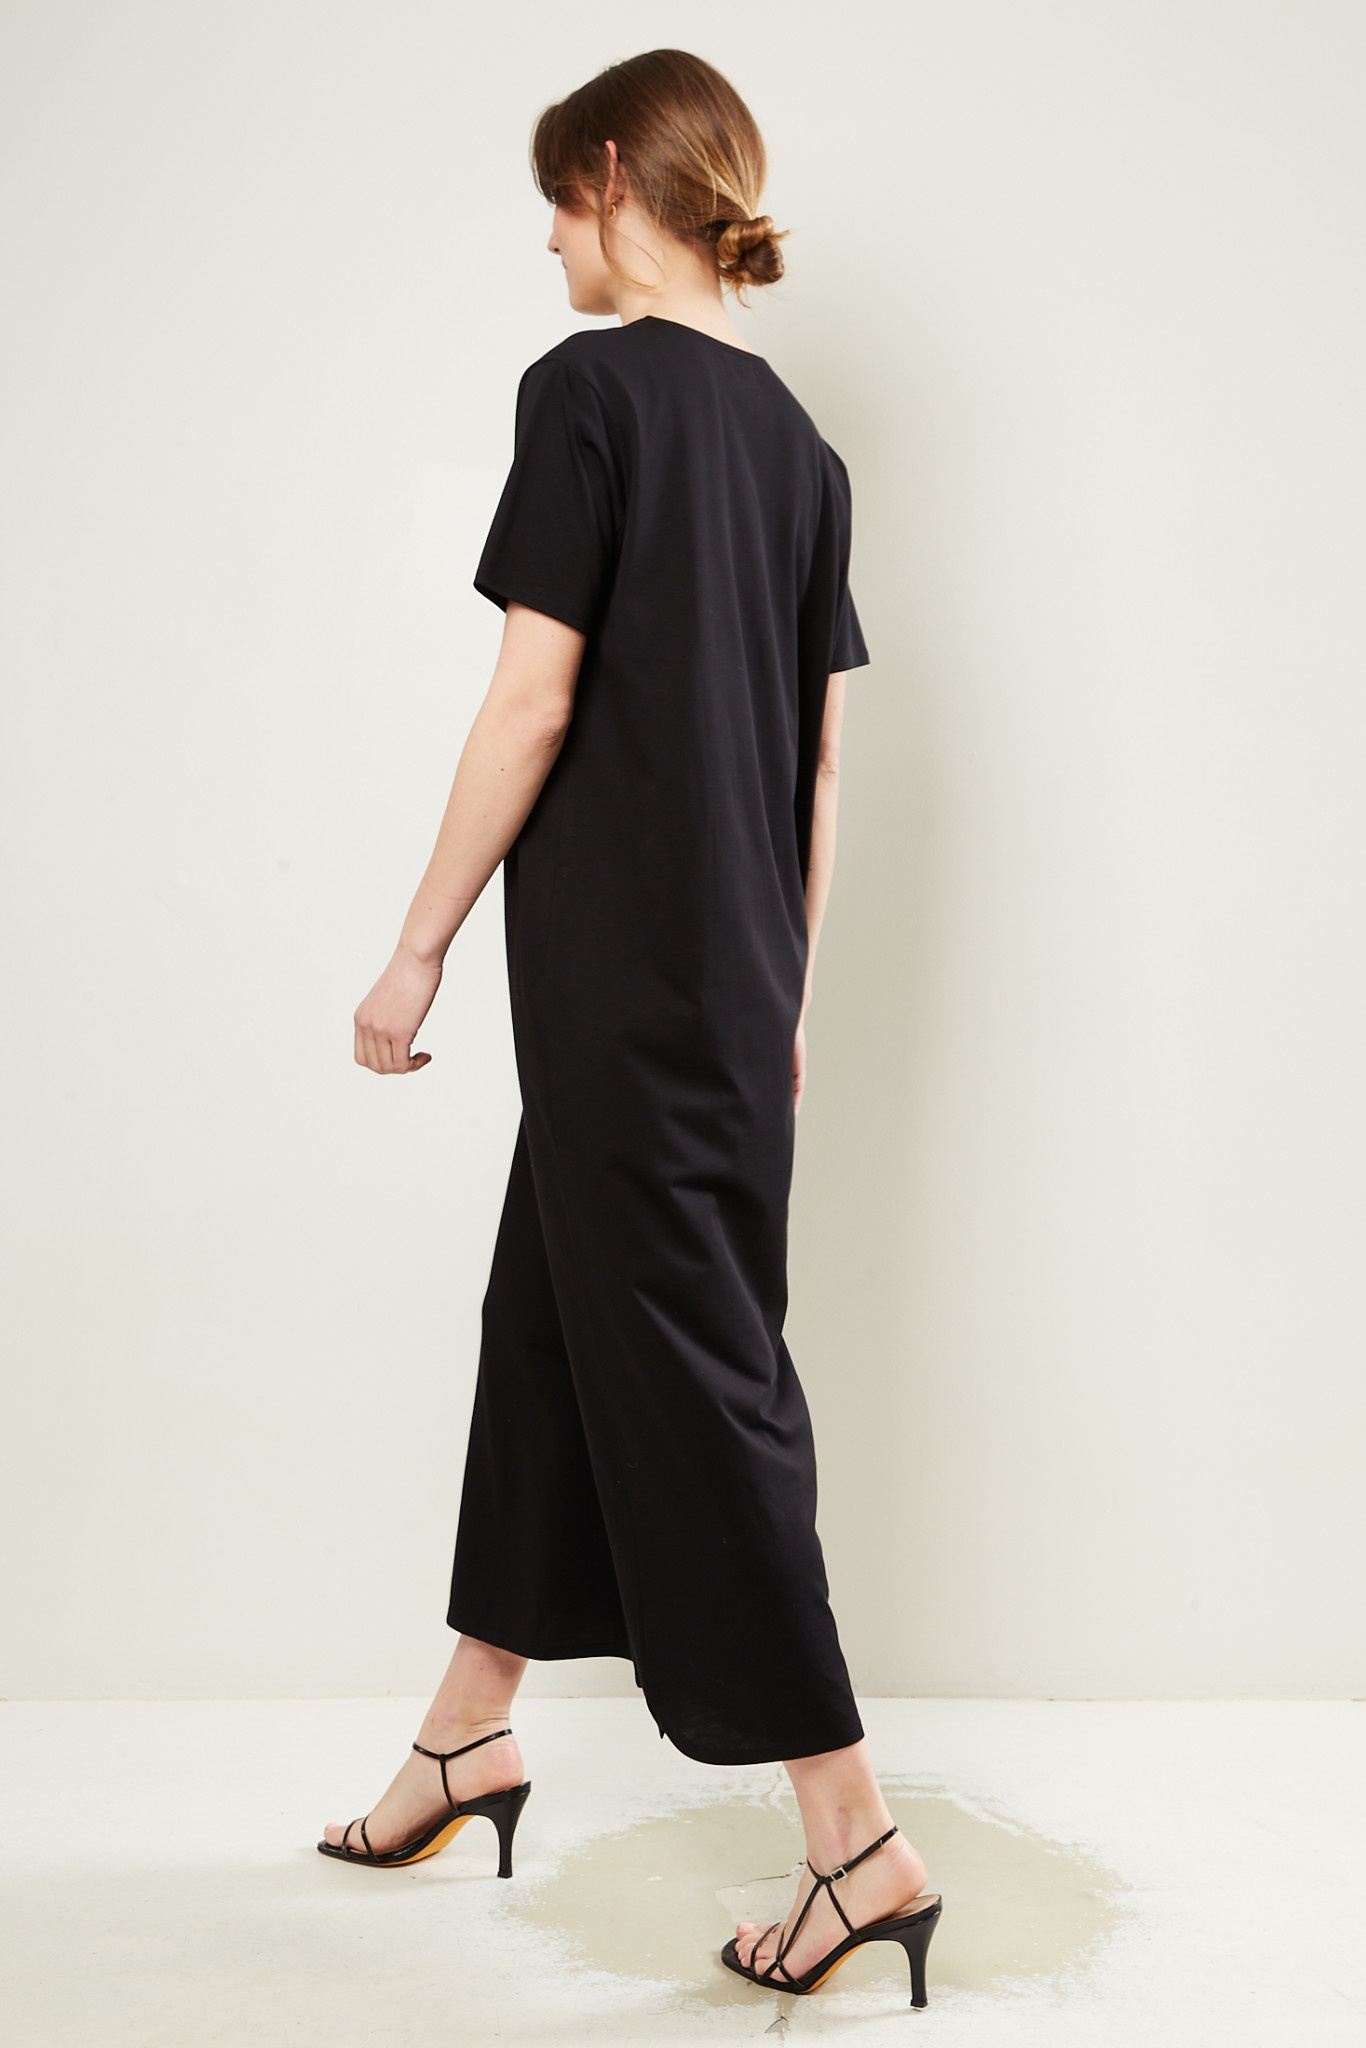 loulou studio - Amini cotton dress